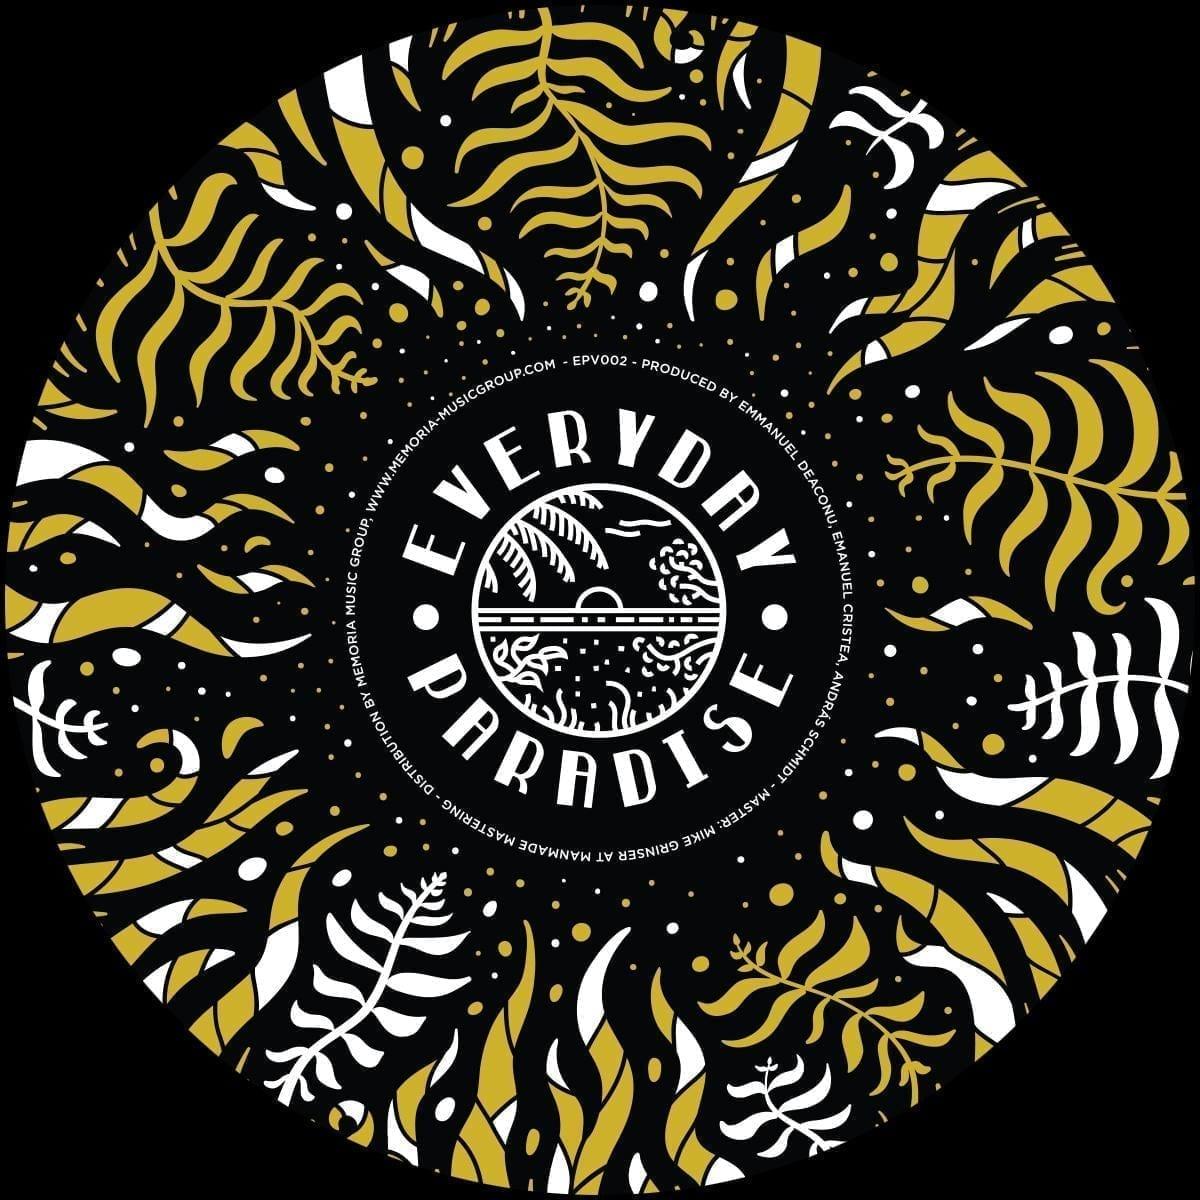 Los Bastoneros - Perspectives EP [Everyday Paradise] back